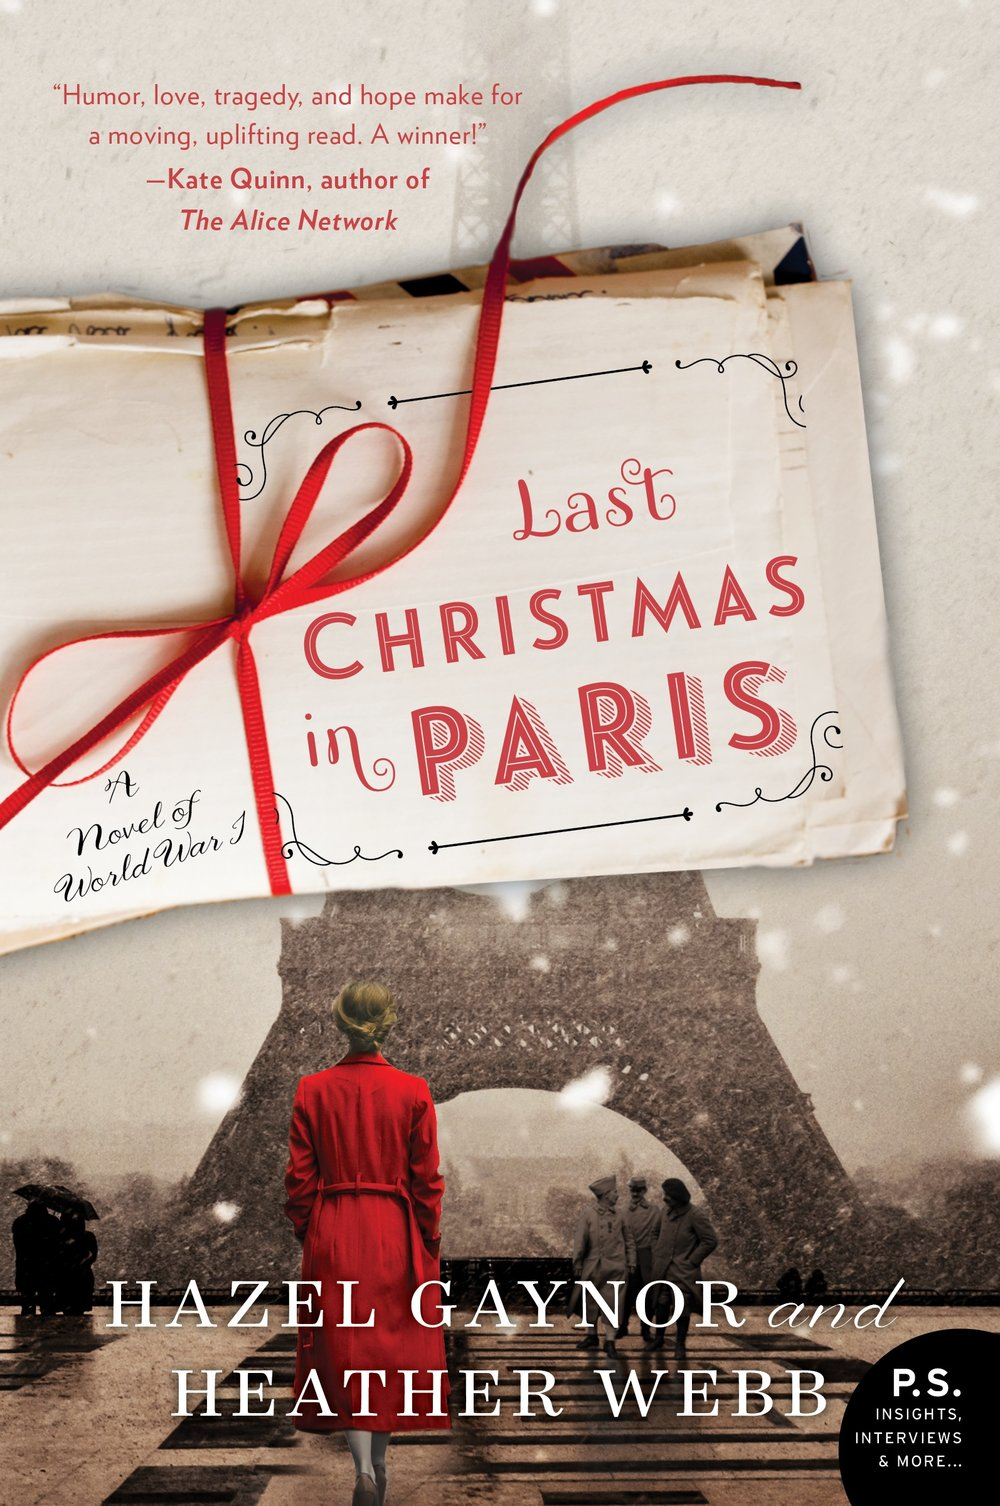 last christmas in paris by hazel gaynor and heather webb.jpg